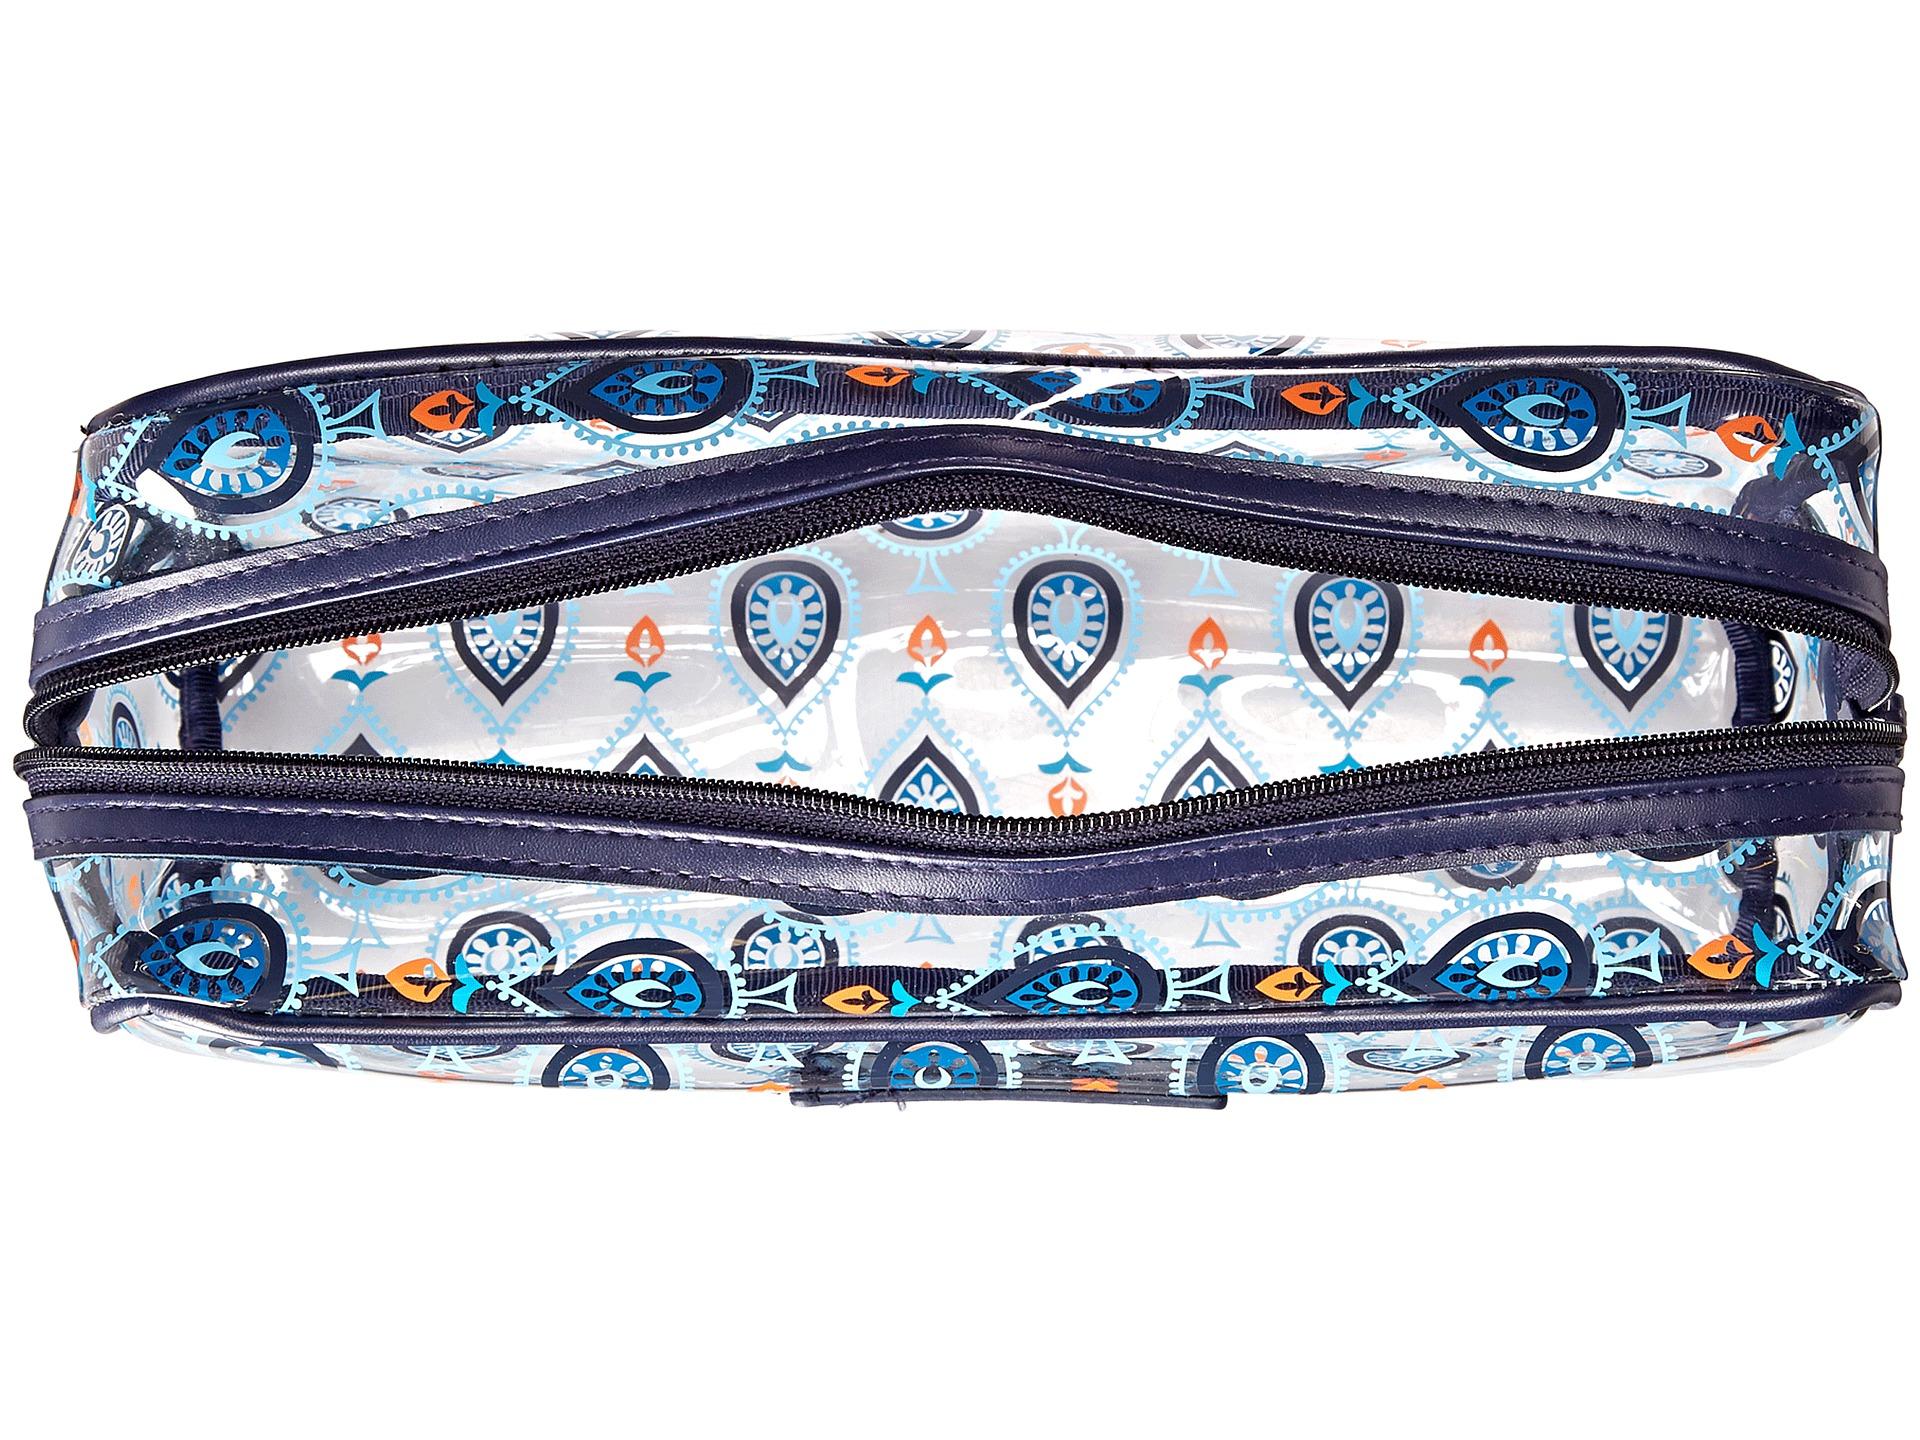 Vera bradley luggage large clear cosmetic marrakesh motifs zappos